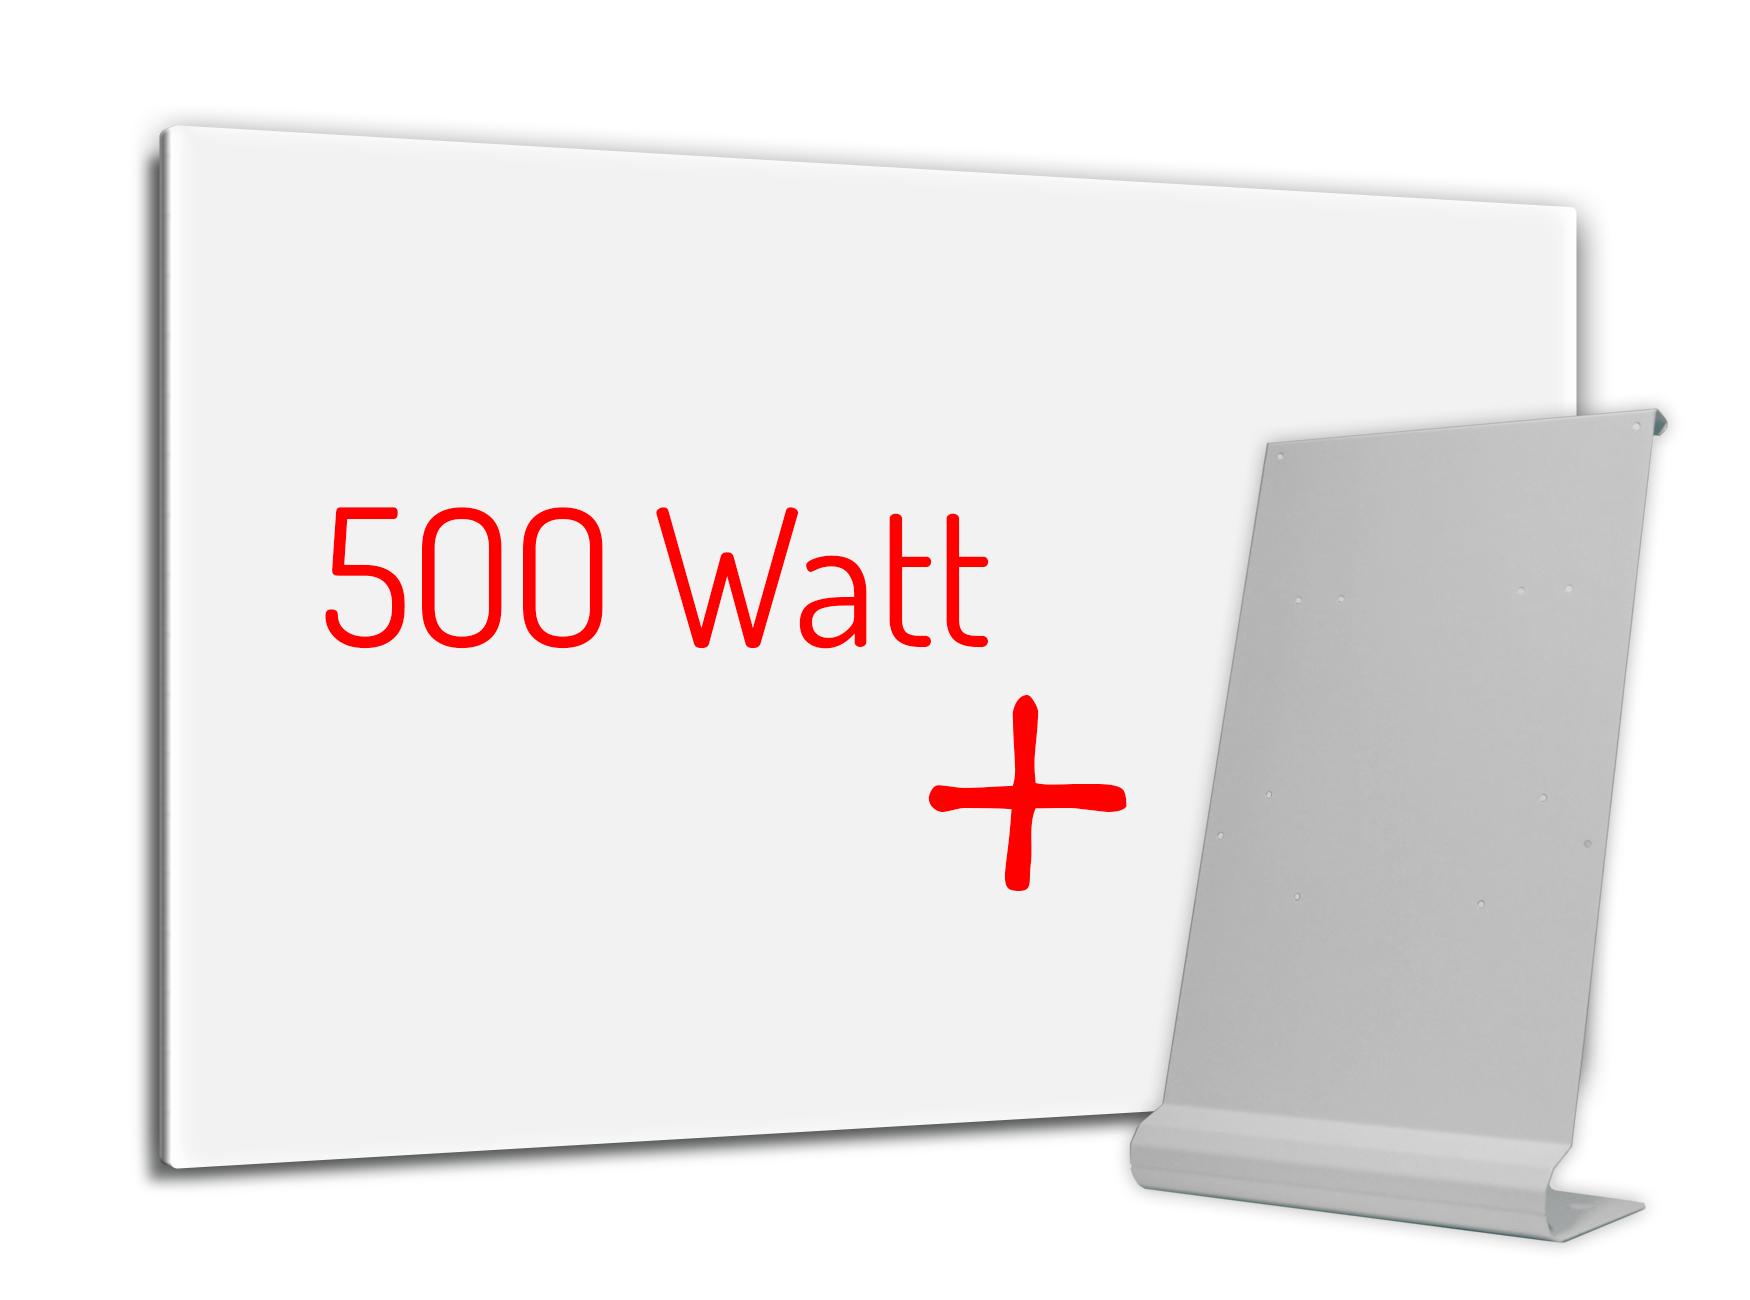 PowerSun Standheizung 500 Watt 60x90cm